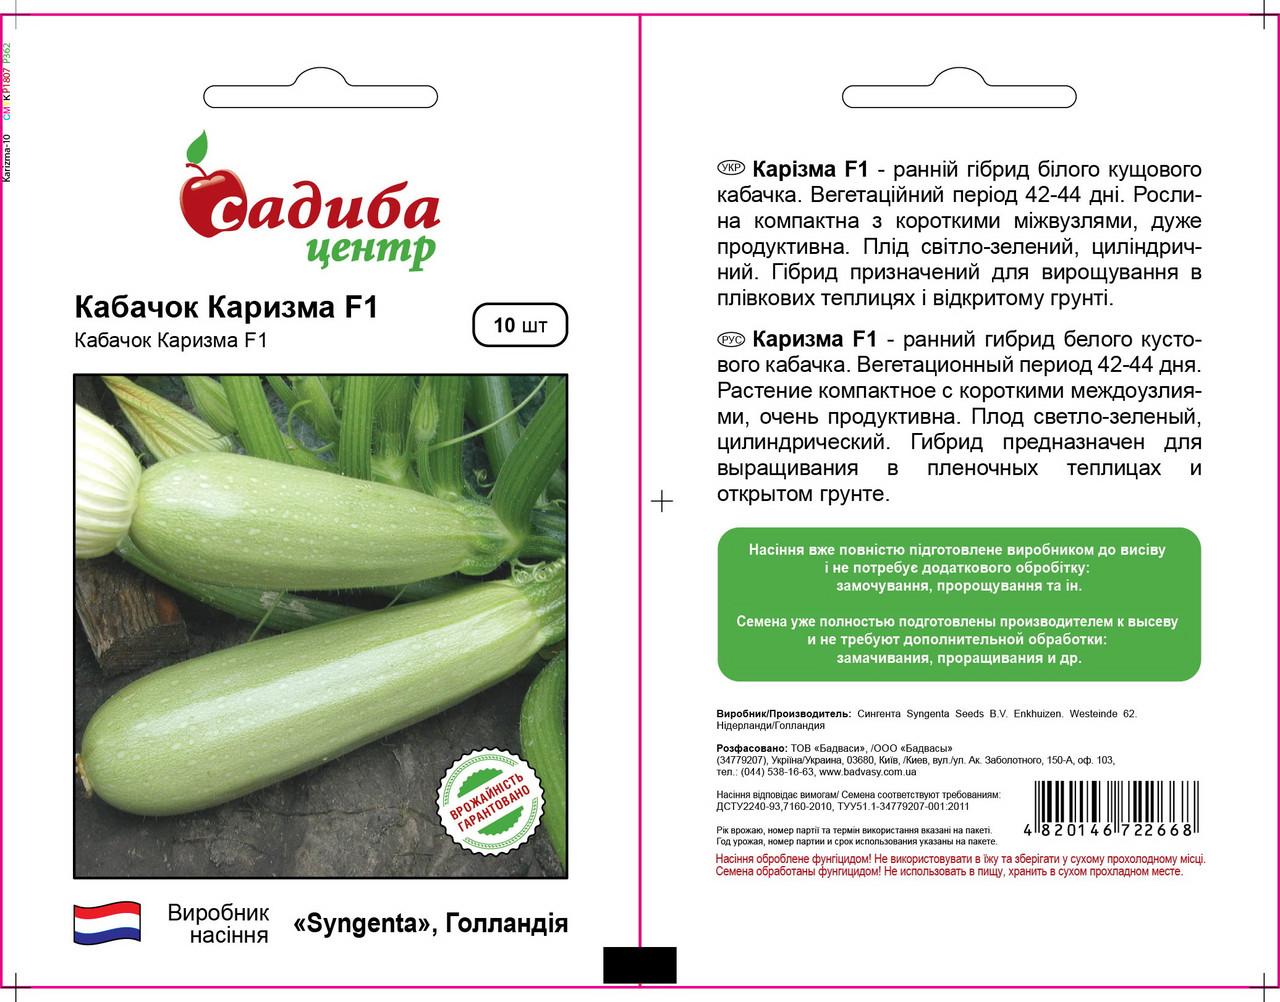 Семена кабачка Каризма F1 (Syngenta, САДЫБА ЦЕНТР), 10 семян — ранний гибрид (40 дней), светлый